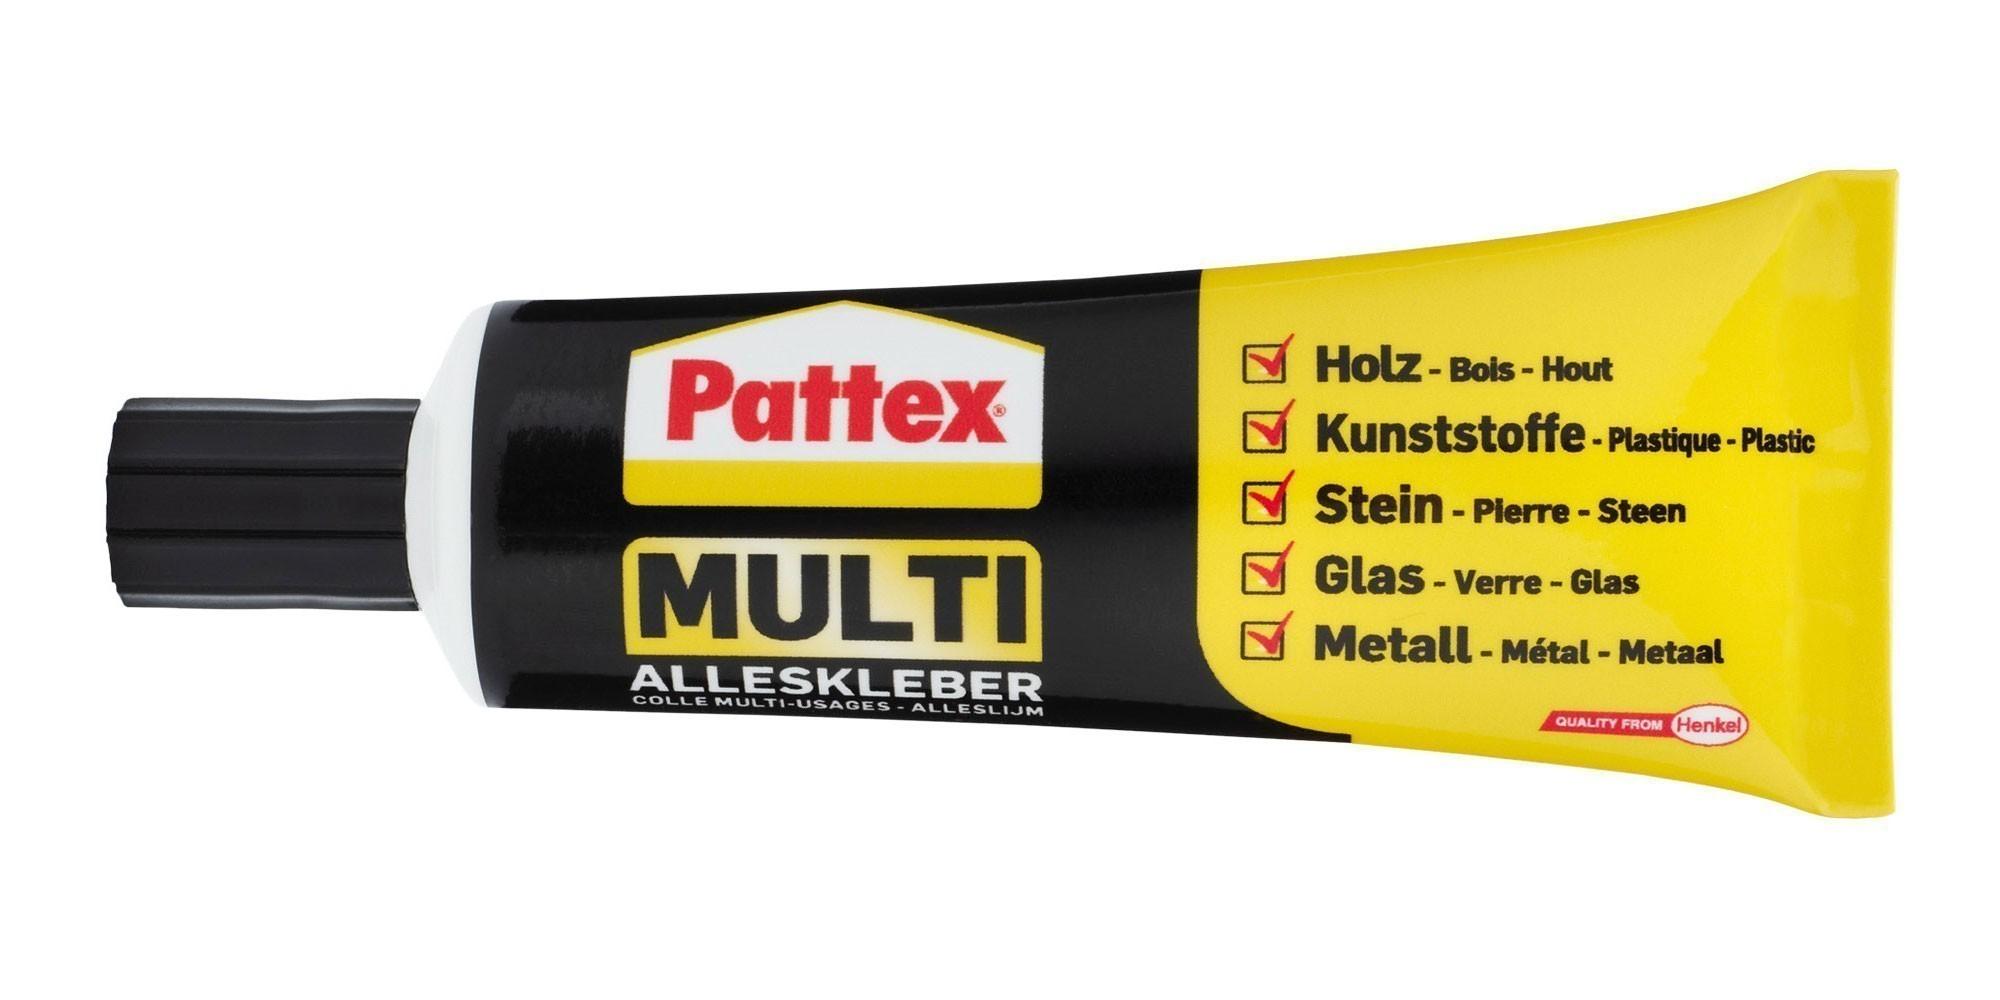 Pattex Alleskleber / Multi Alleskleber 50g Bild 1